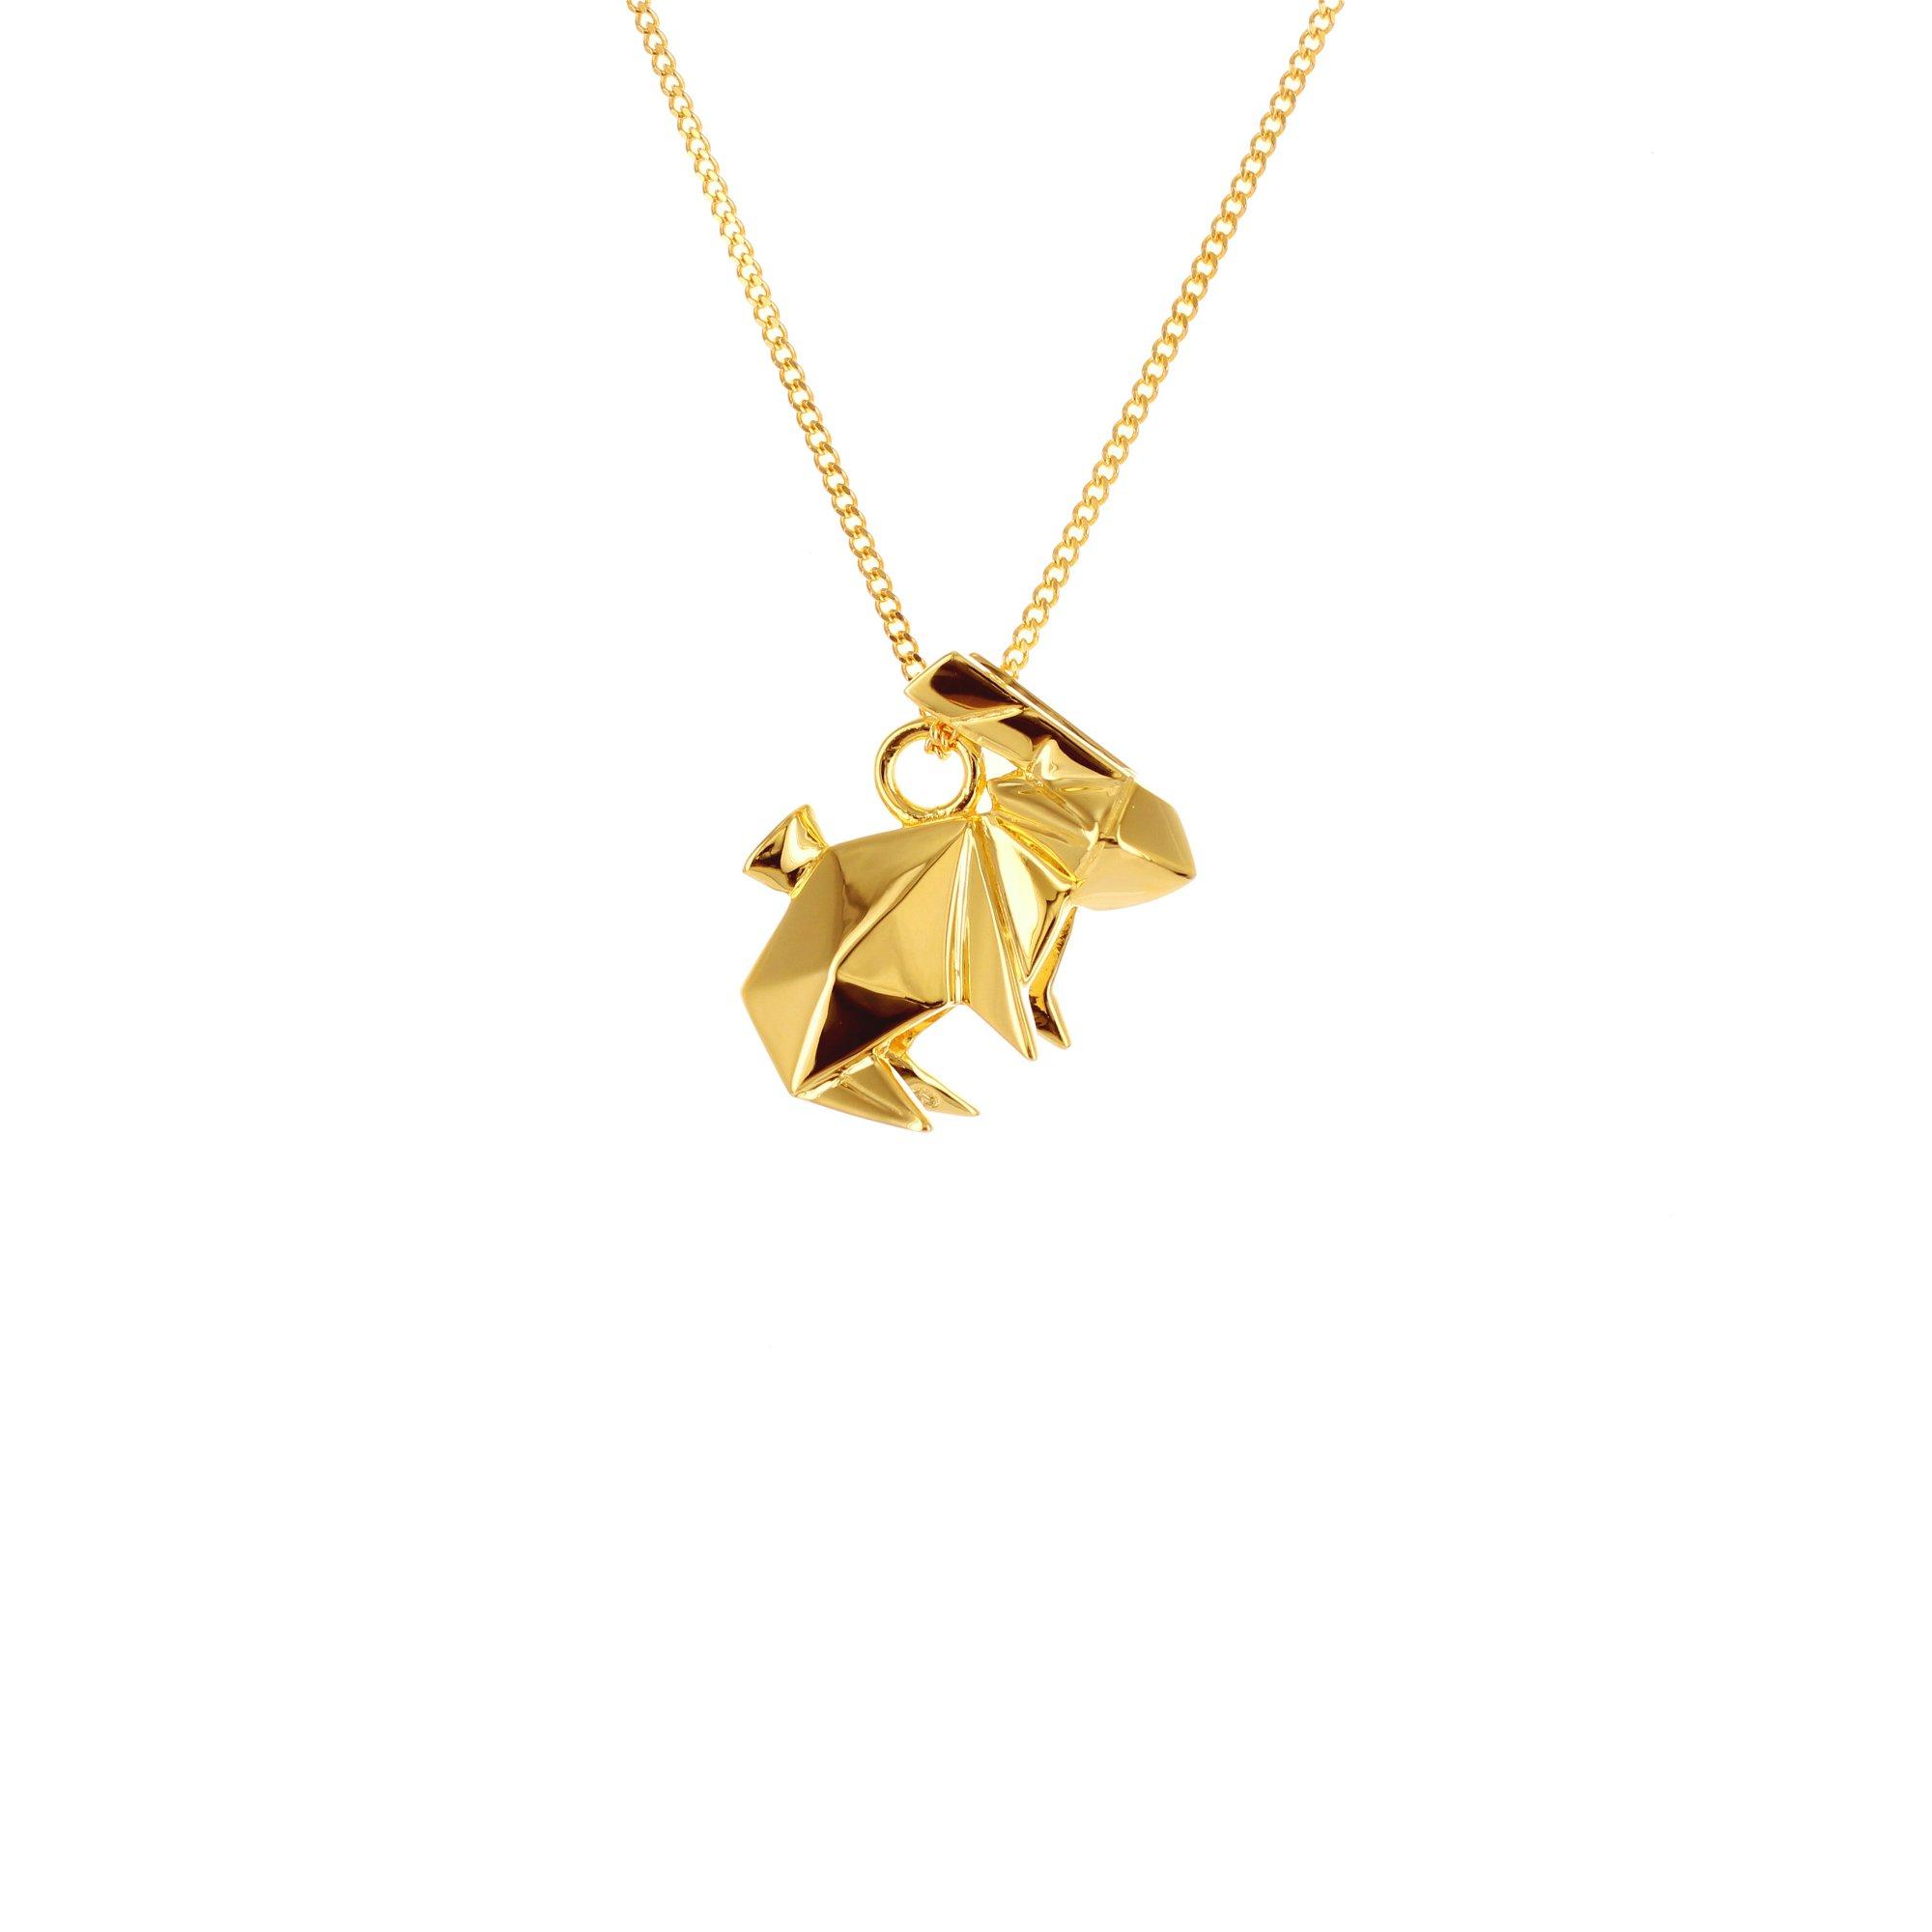 Sterling Silver & Gold Mini Rabbit Origami Necklace